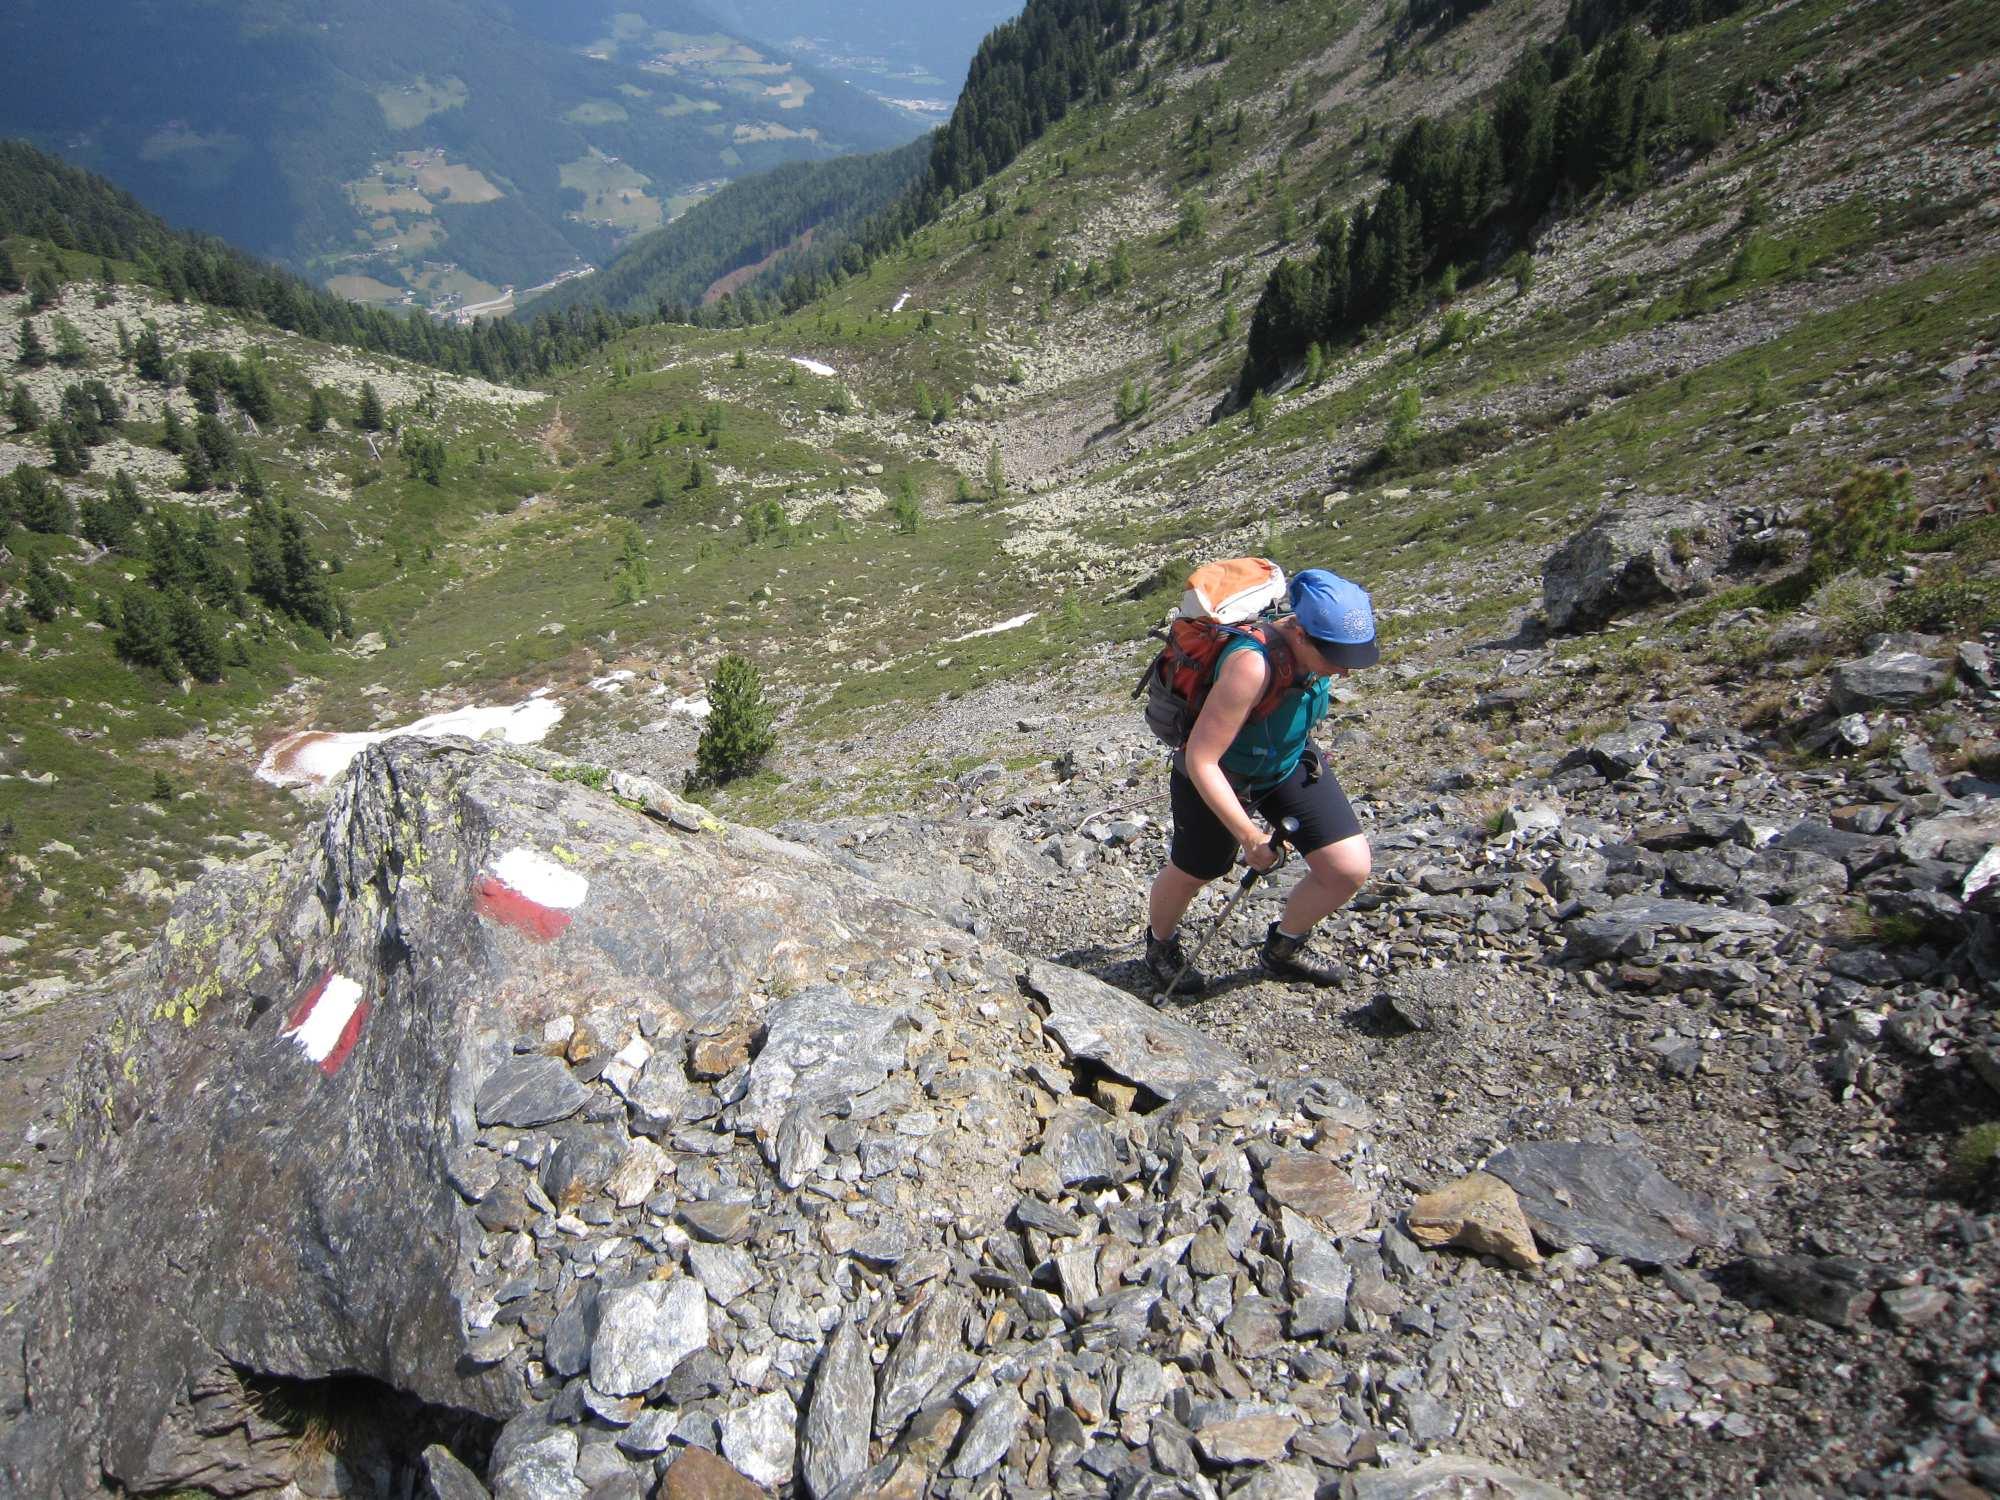 Bergsteigertipp: Stockeinsatz